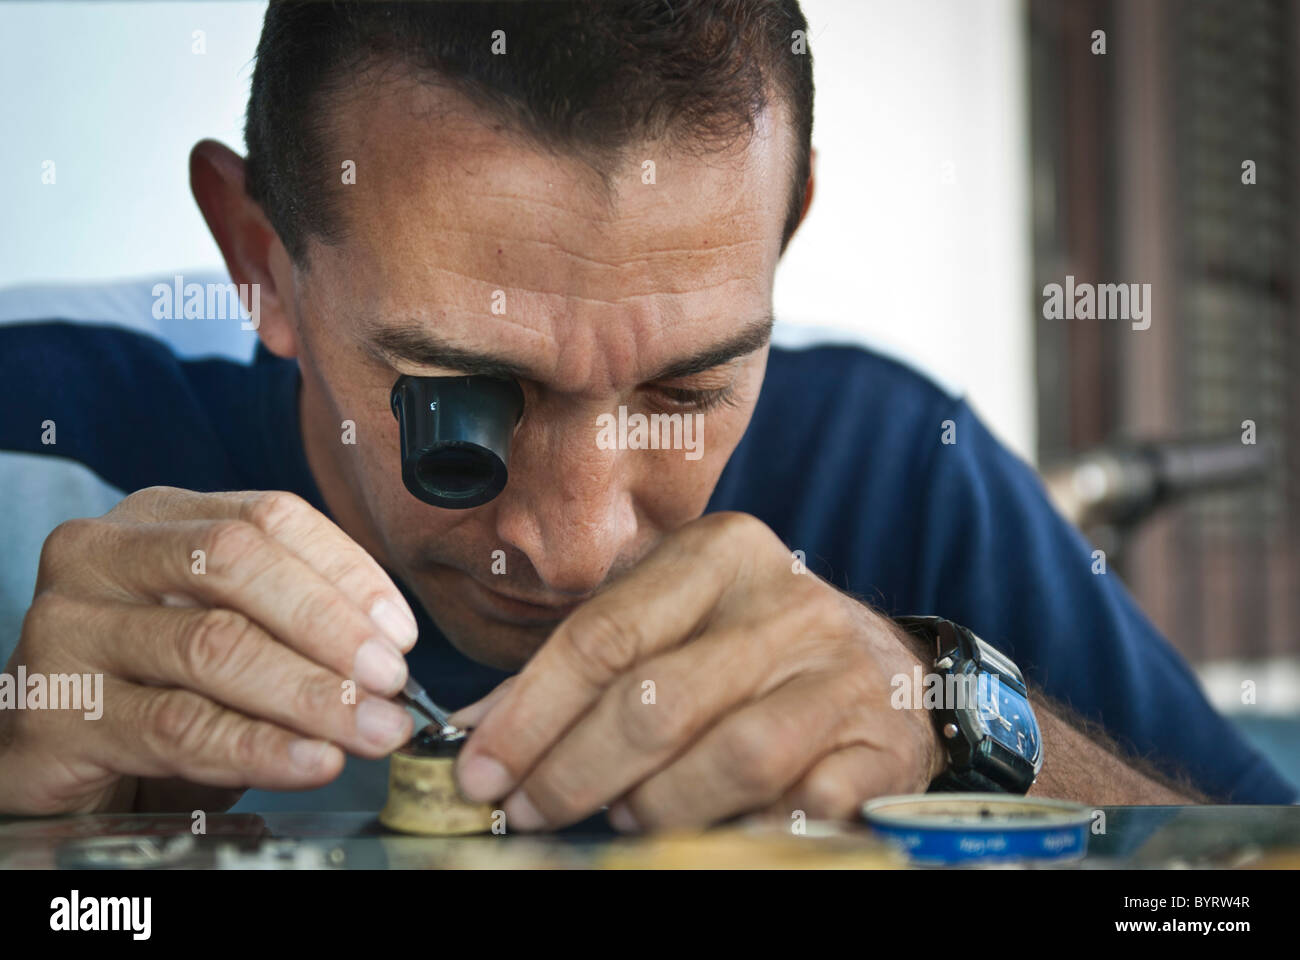 Man repairing a watch with a monocle. Santiago de Cuba, Cuba, Caribbean - Stock Image